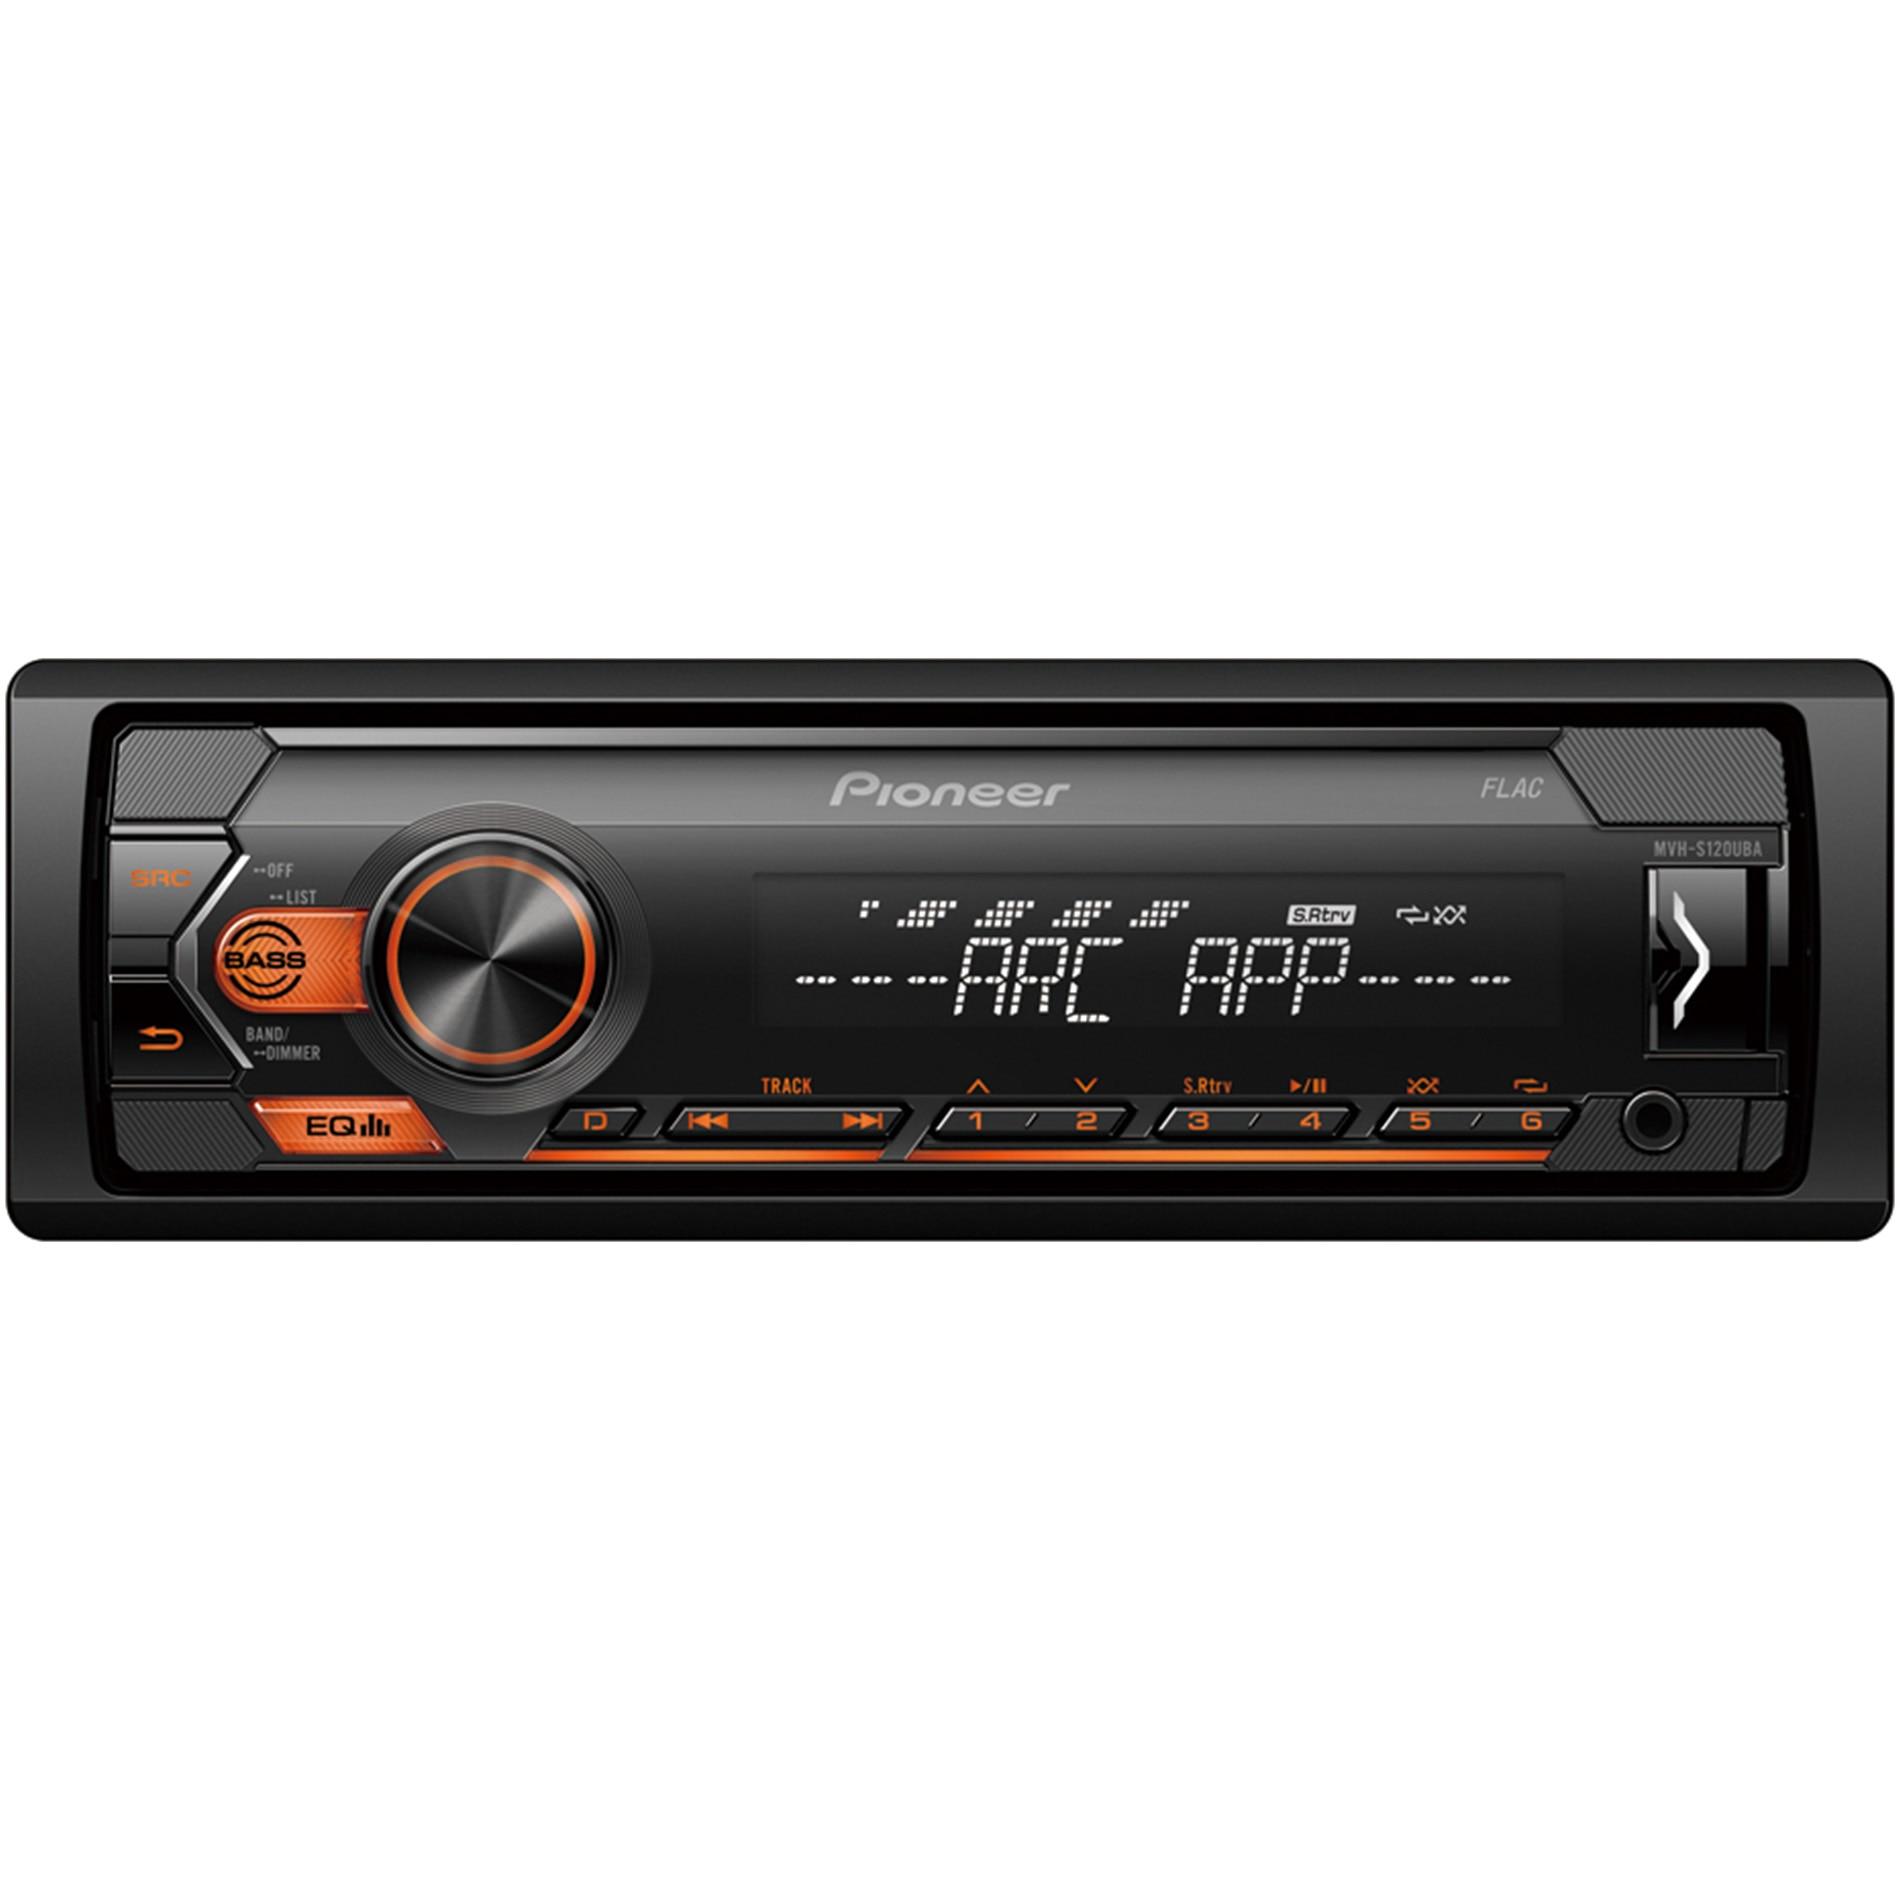 Fotografie Radio MP3 auto Pioneer MVH-S120UBA, 1DIN, 4x50W, USB, compatibil cu dispozitive Android, taste Portocaliu, display Alb